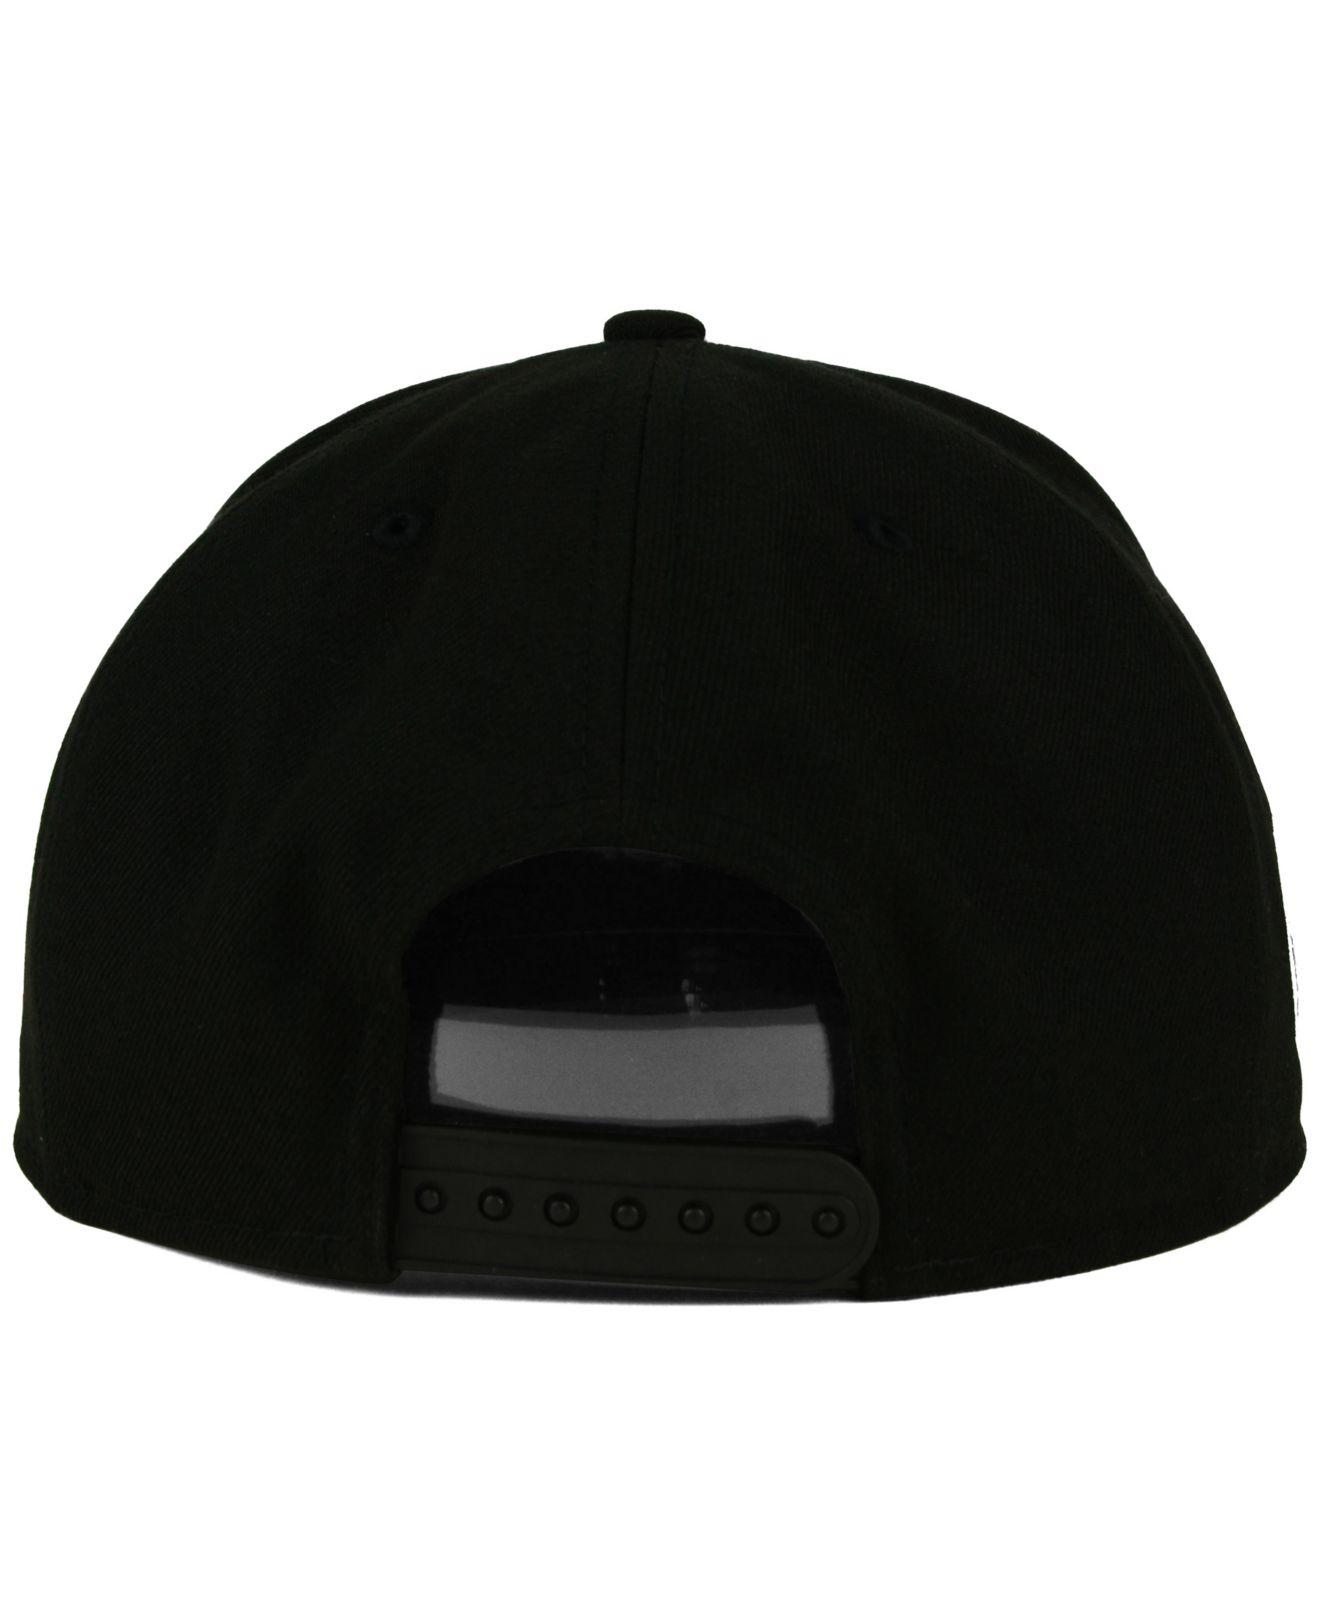 timeless design 92878 3fe8e KTZ Calgary Flames All Day 9fifty Snapback Cap in Black for Men - Lyst